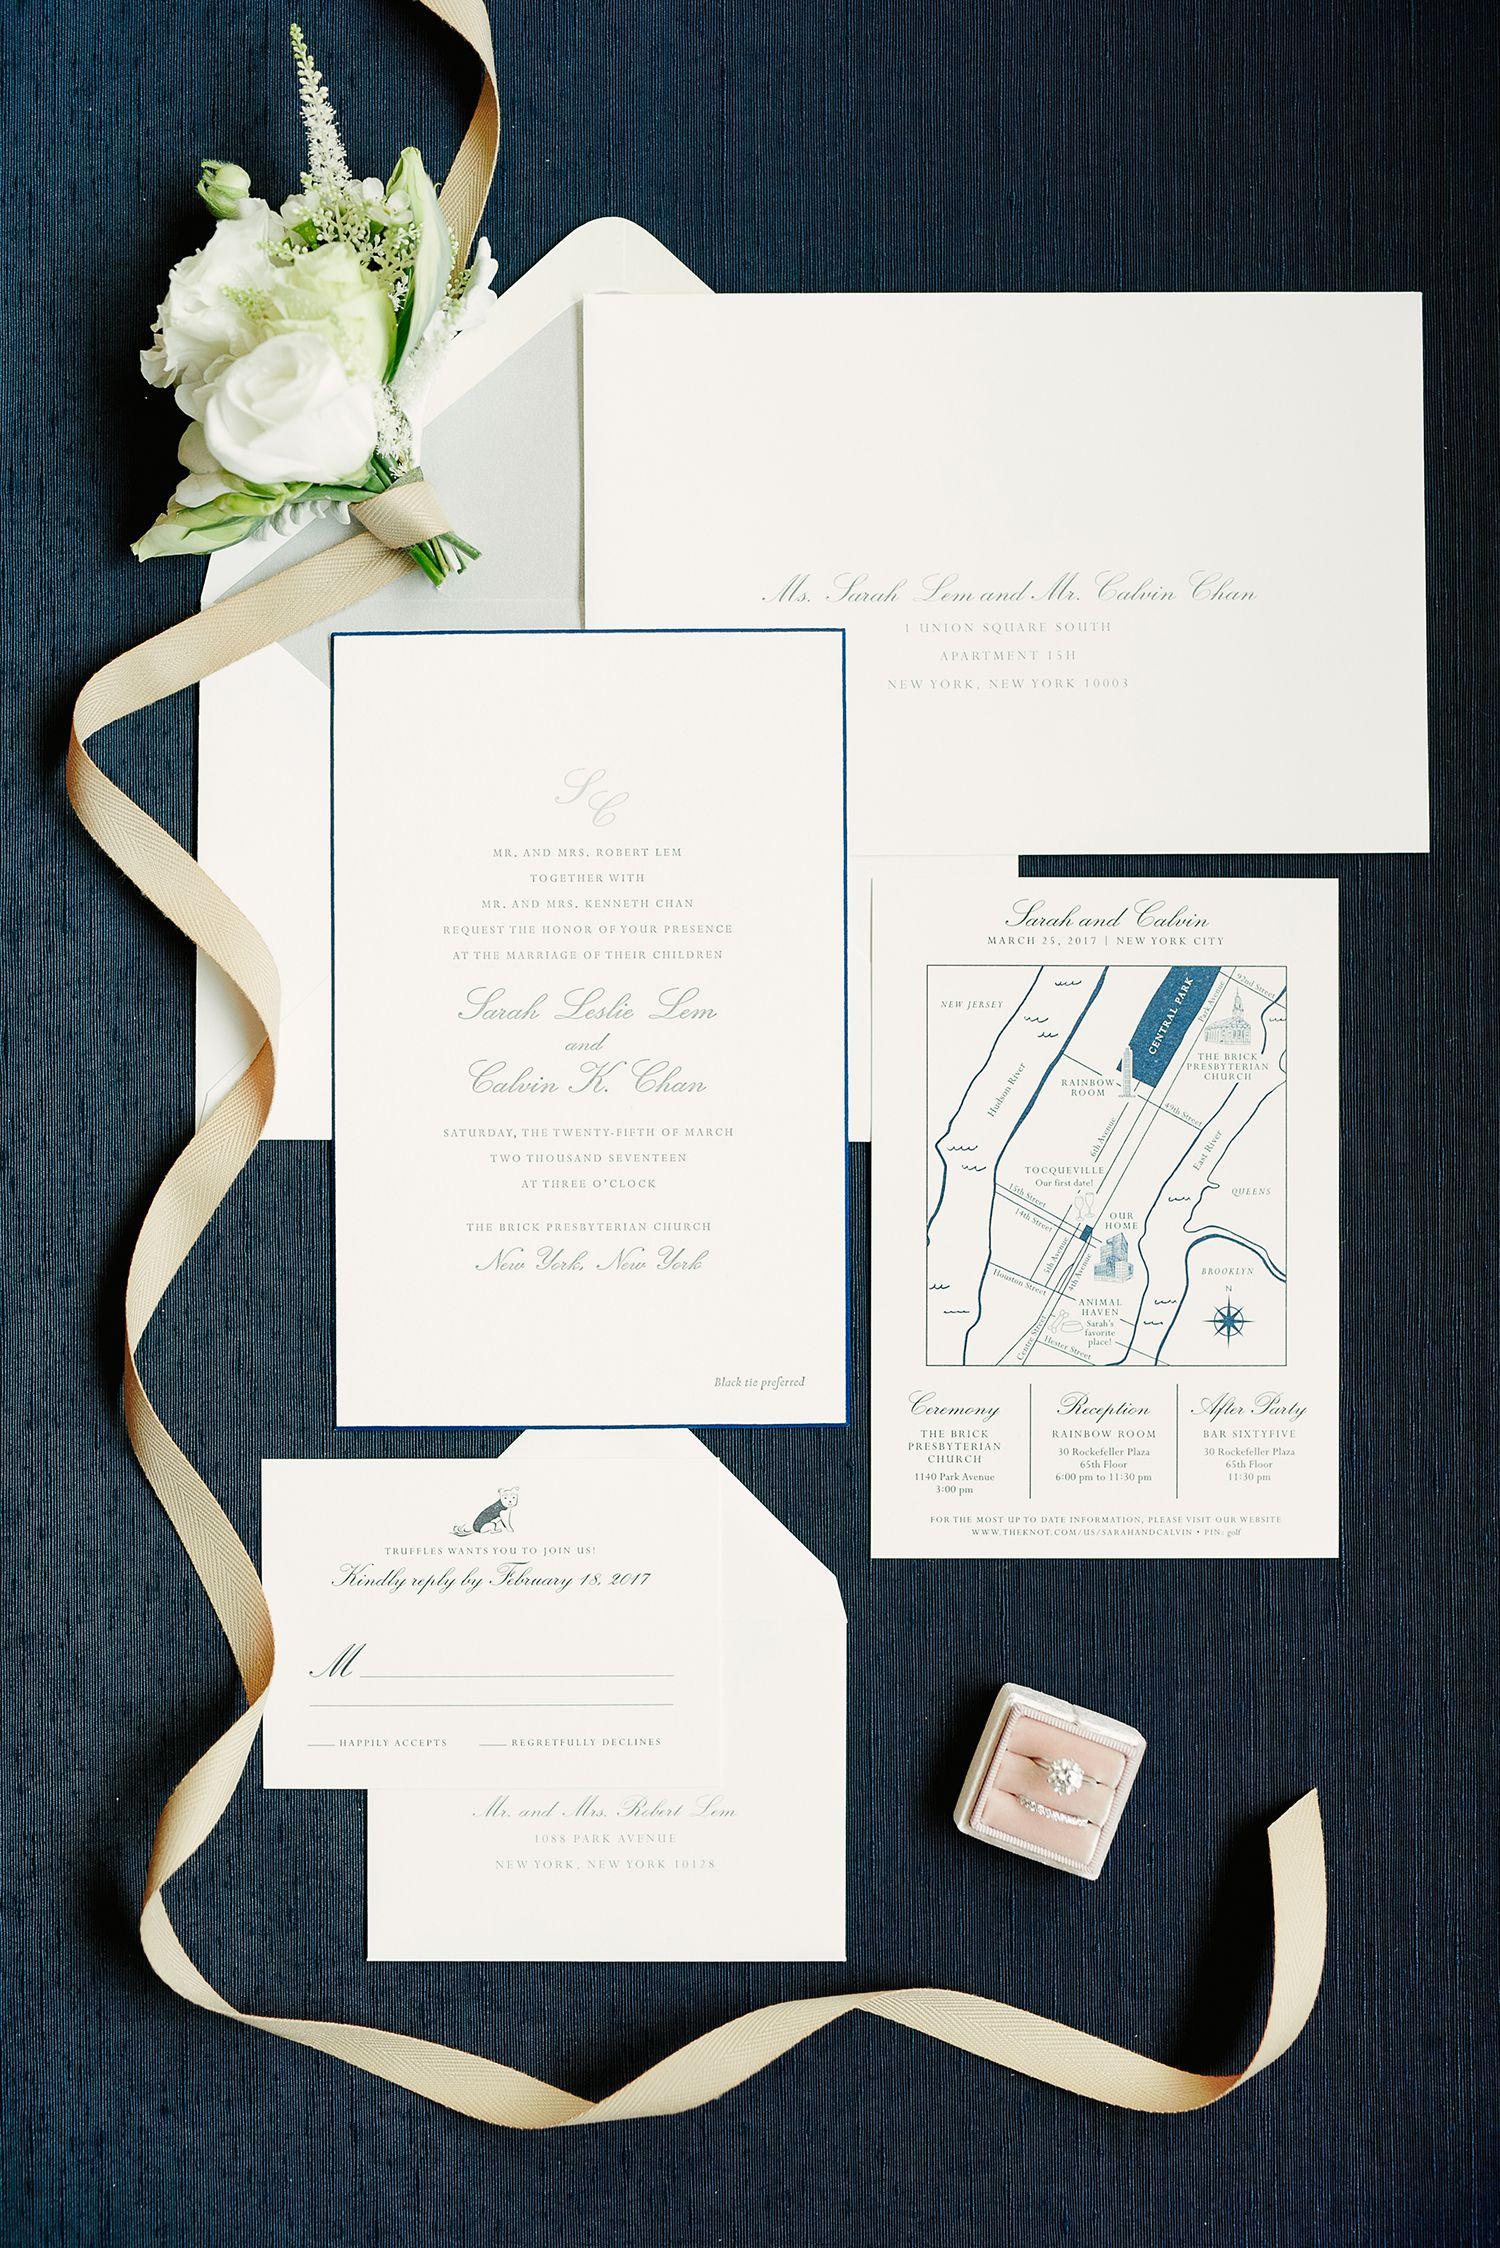 Fourteen Forty Is A Wedding Invitation Design Studio Located In New York City We Create Beauti Custom Wedding Invitations Nyc Wedding Photography Rainbow Room